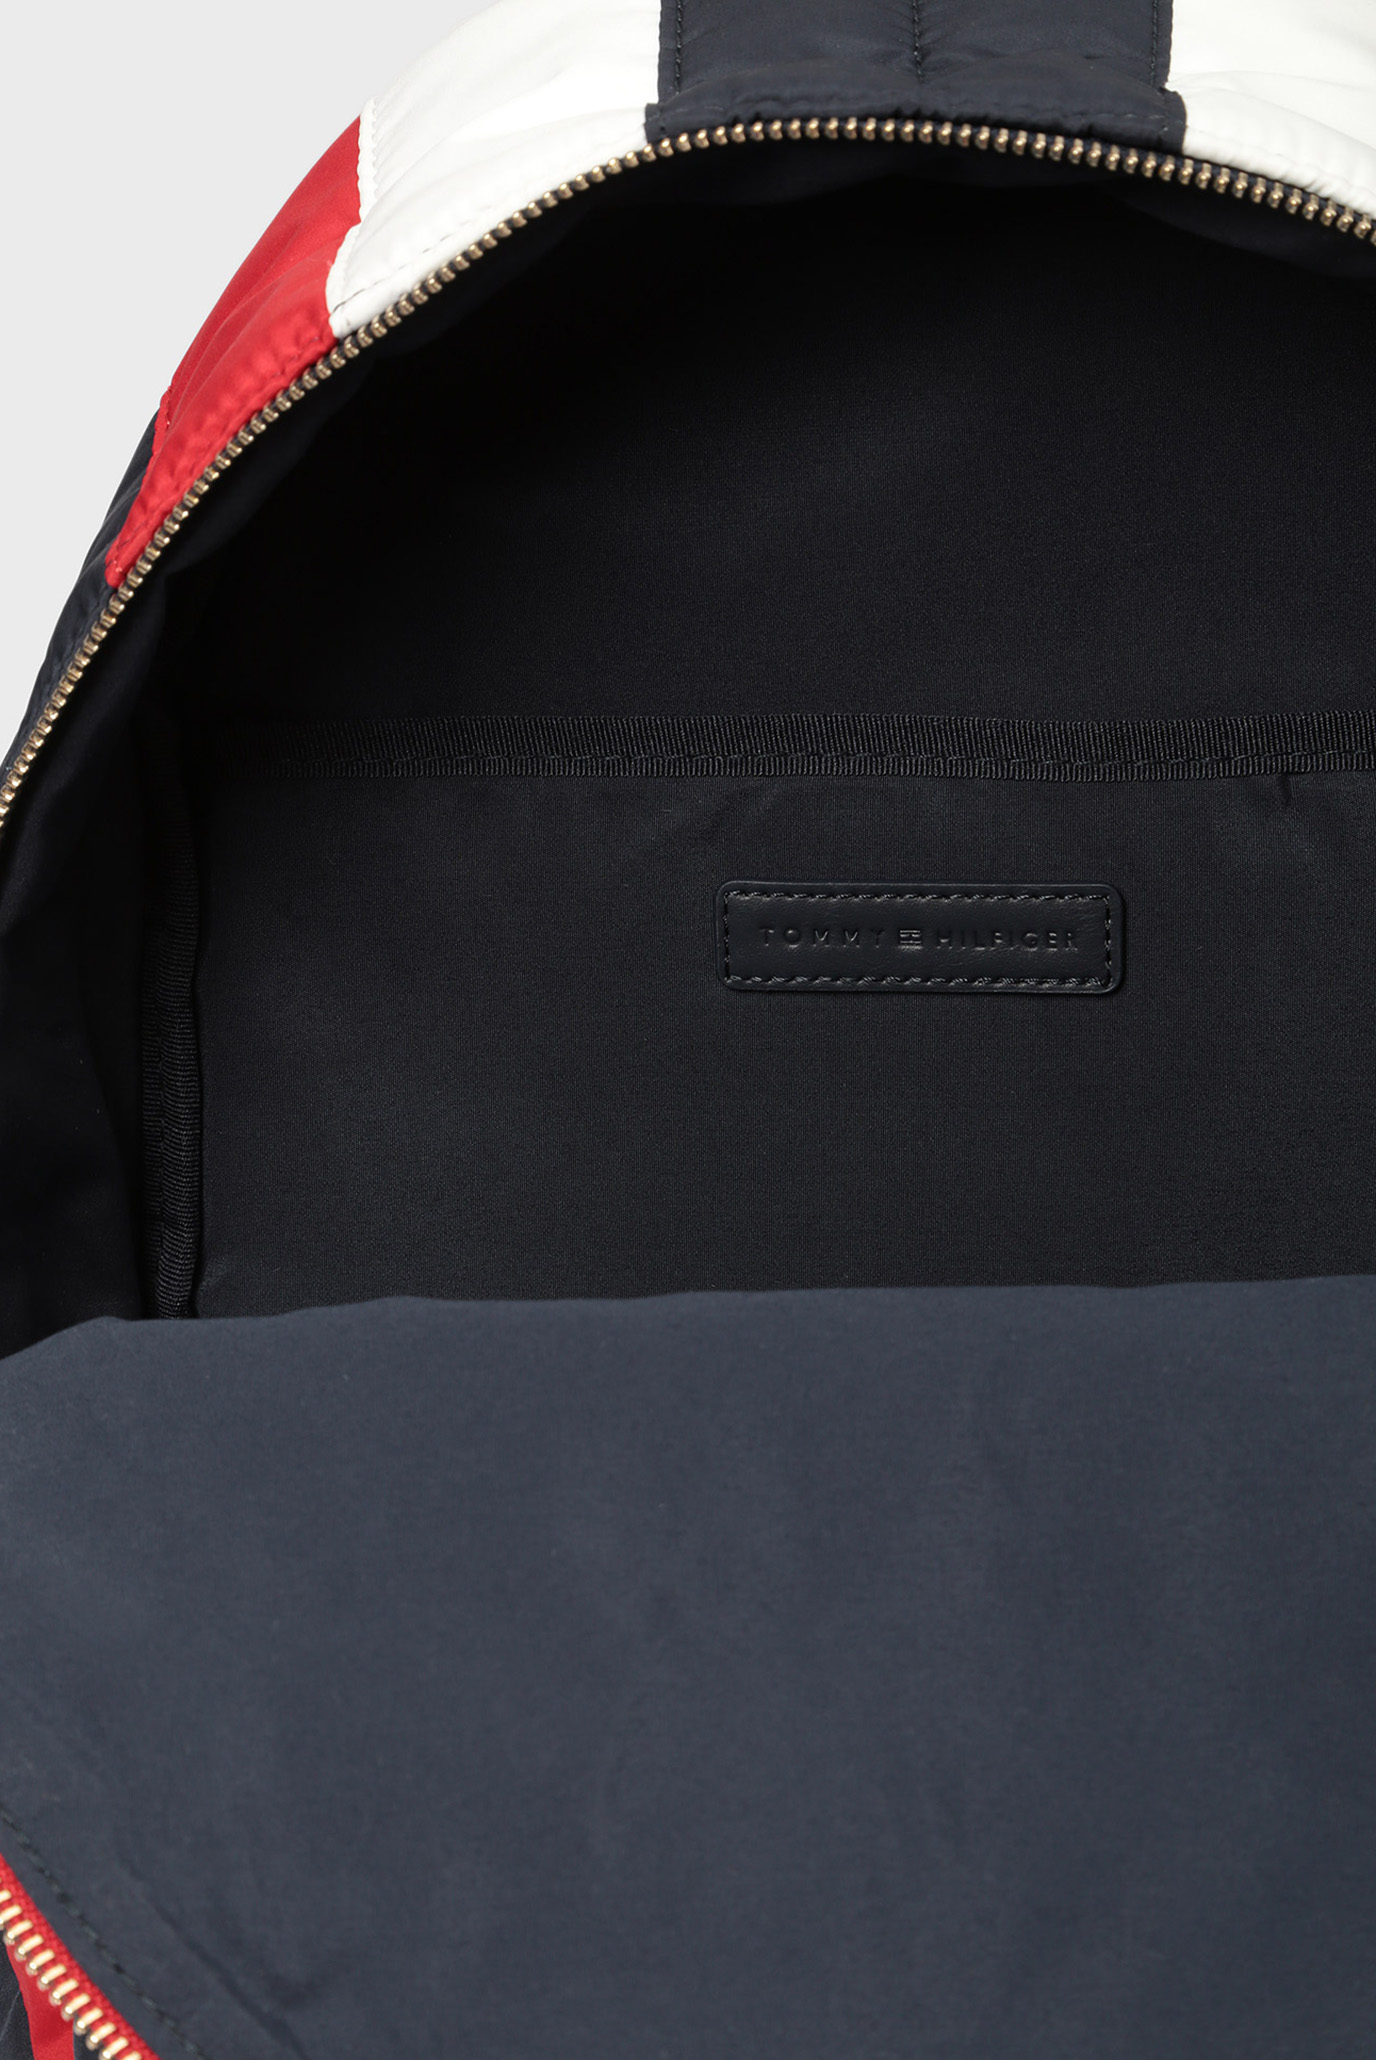 Купить Женский рюкзак POPPY CHEVRON Tommy Hilfiger Tommy Hilfiger AW0AW05844 – Киев, Украина. Цены в интернет магазине MD Fashion